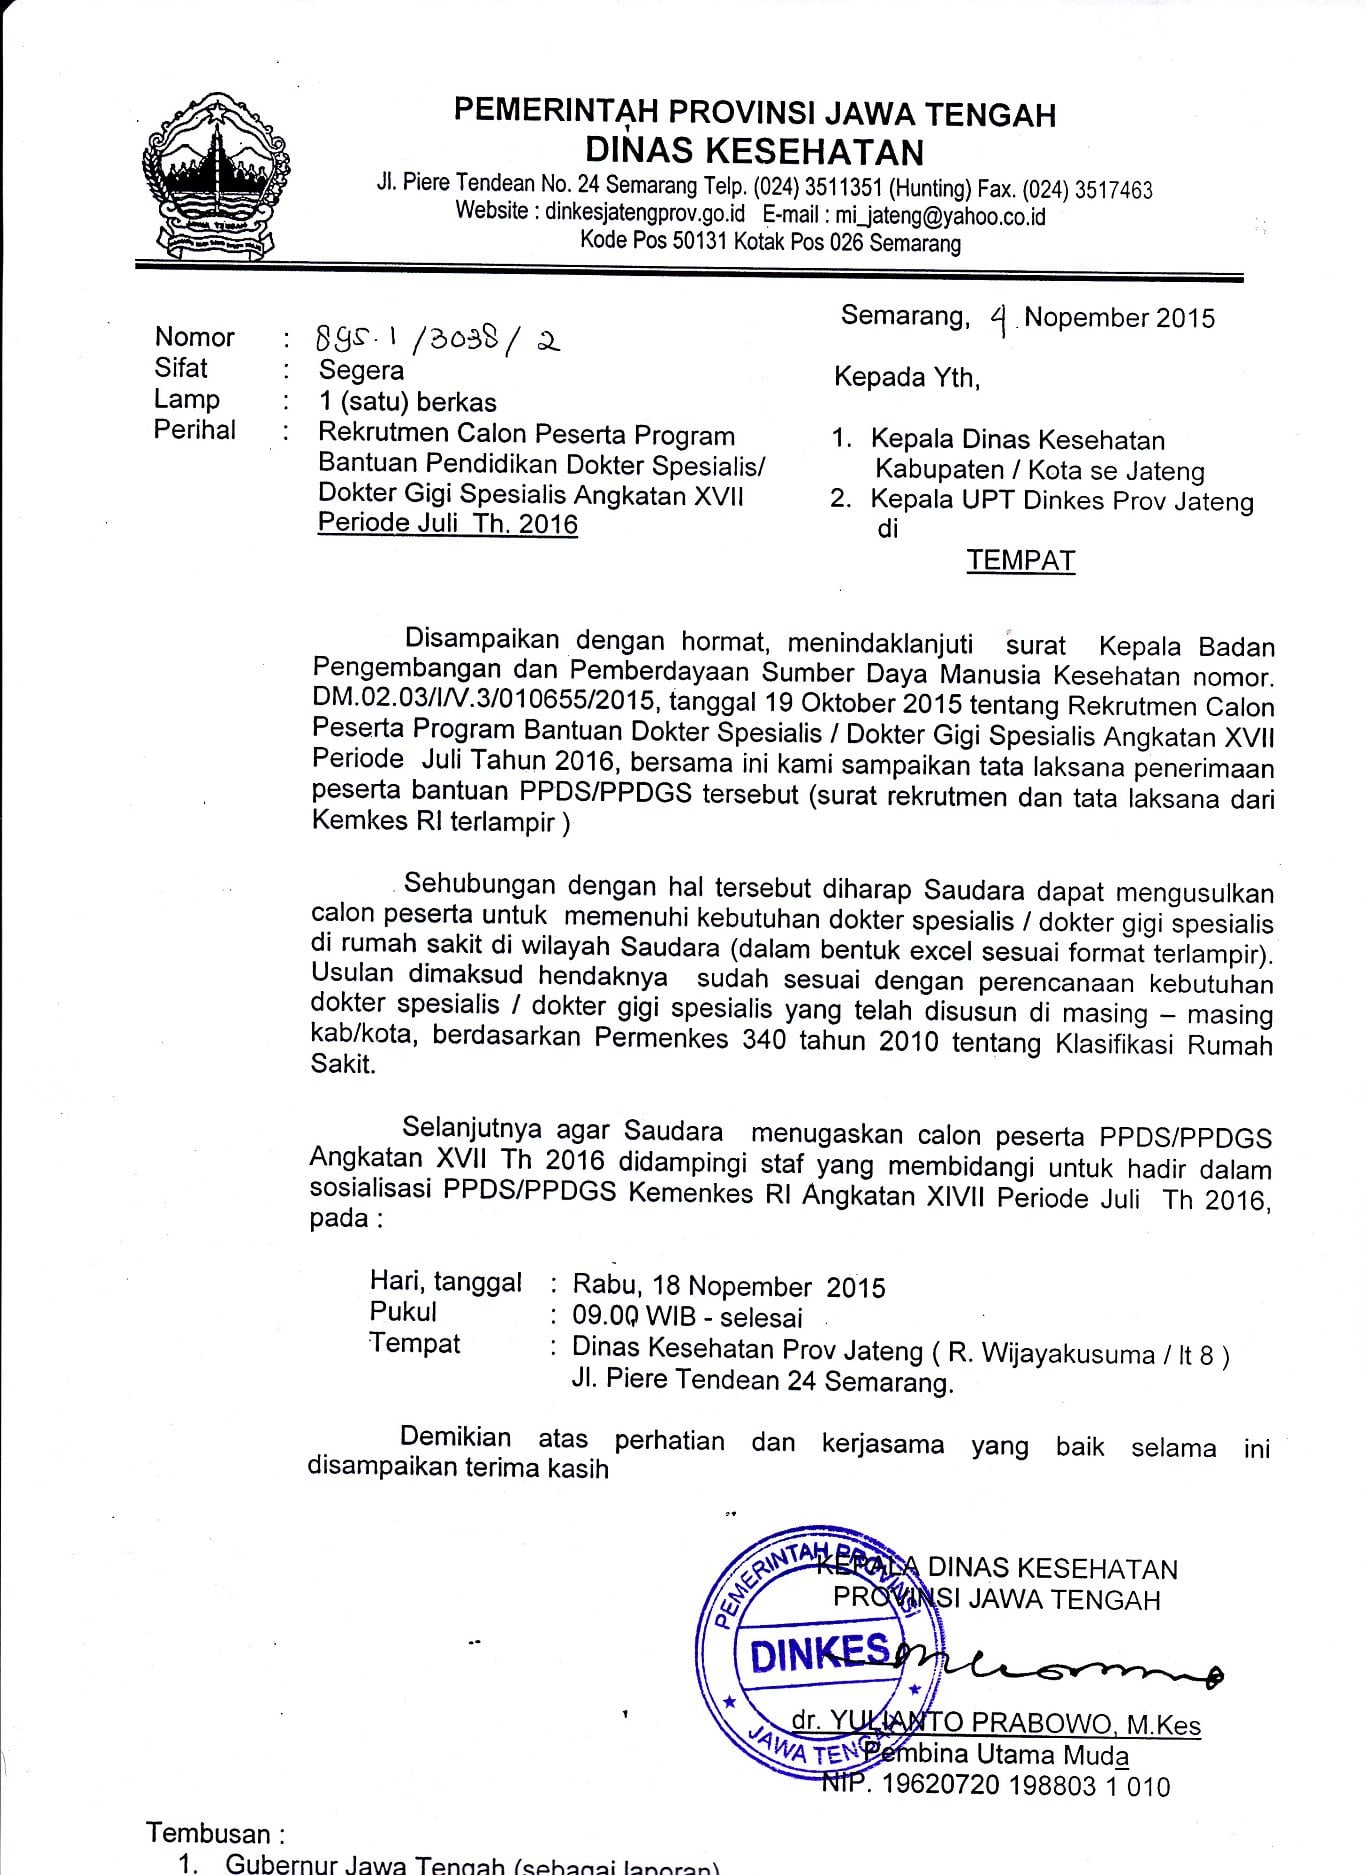 Surat Dinas Instansi Pemerintahan Kesehatan